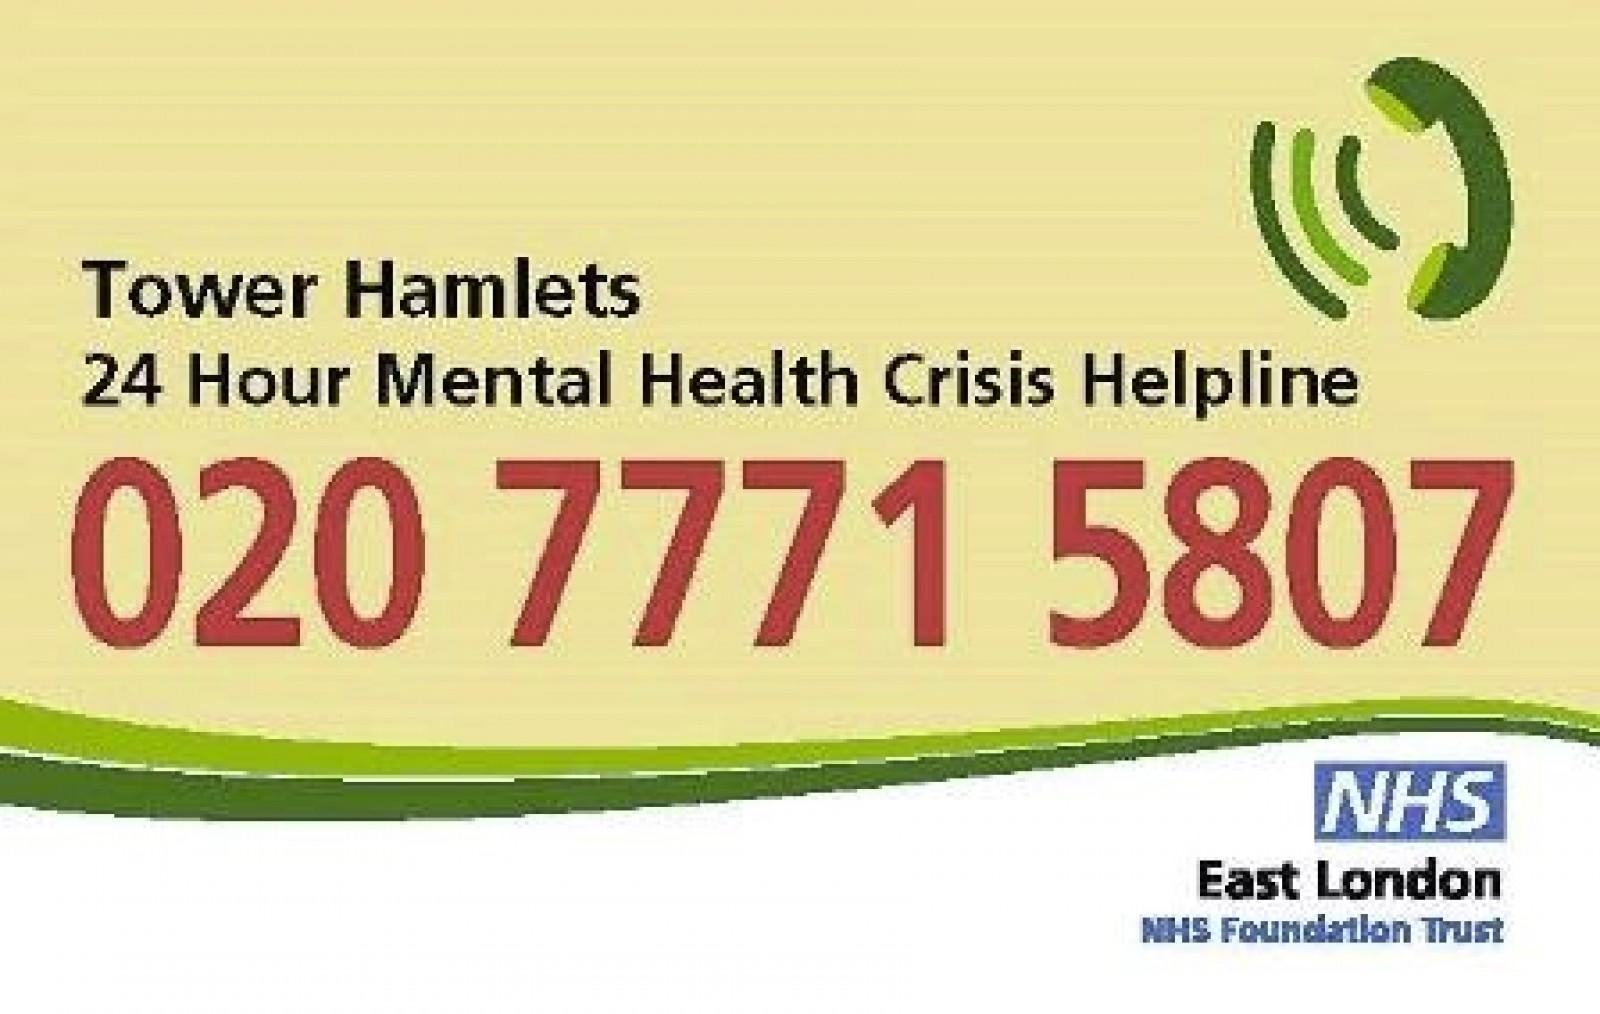 Tower Hamlets Mental Health Crisis Helpline